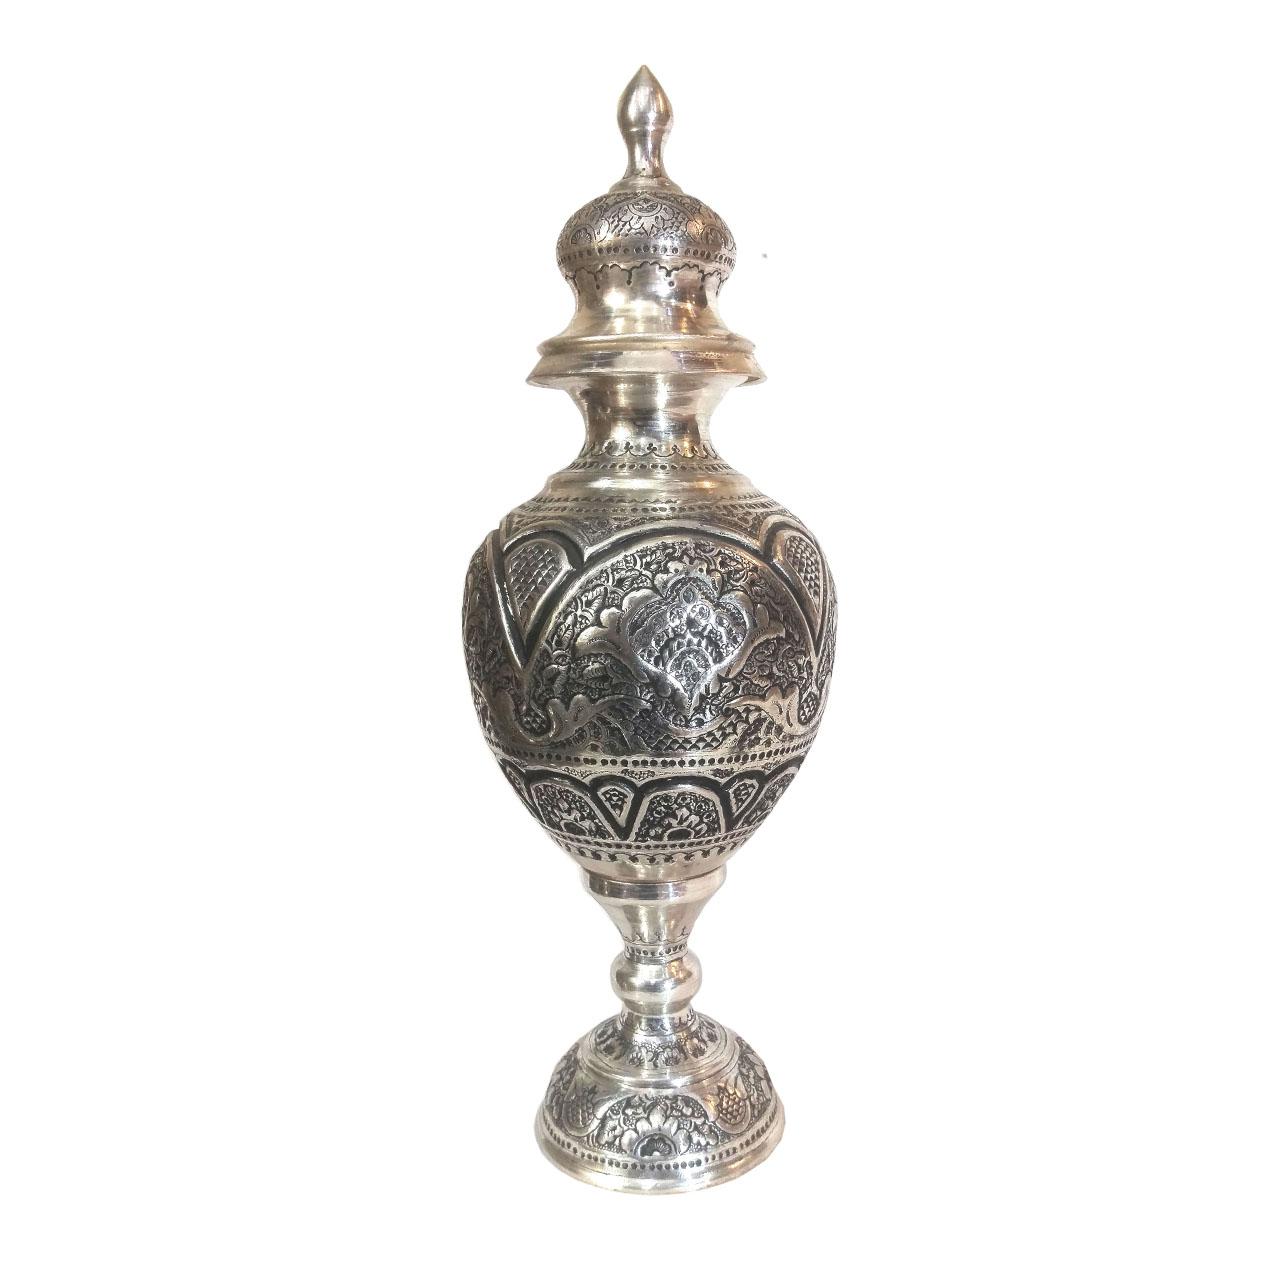 گلاب پاش قلمزنی لوح هنر کد 1172